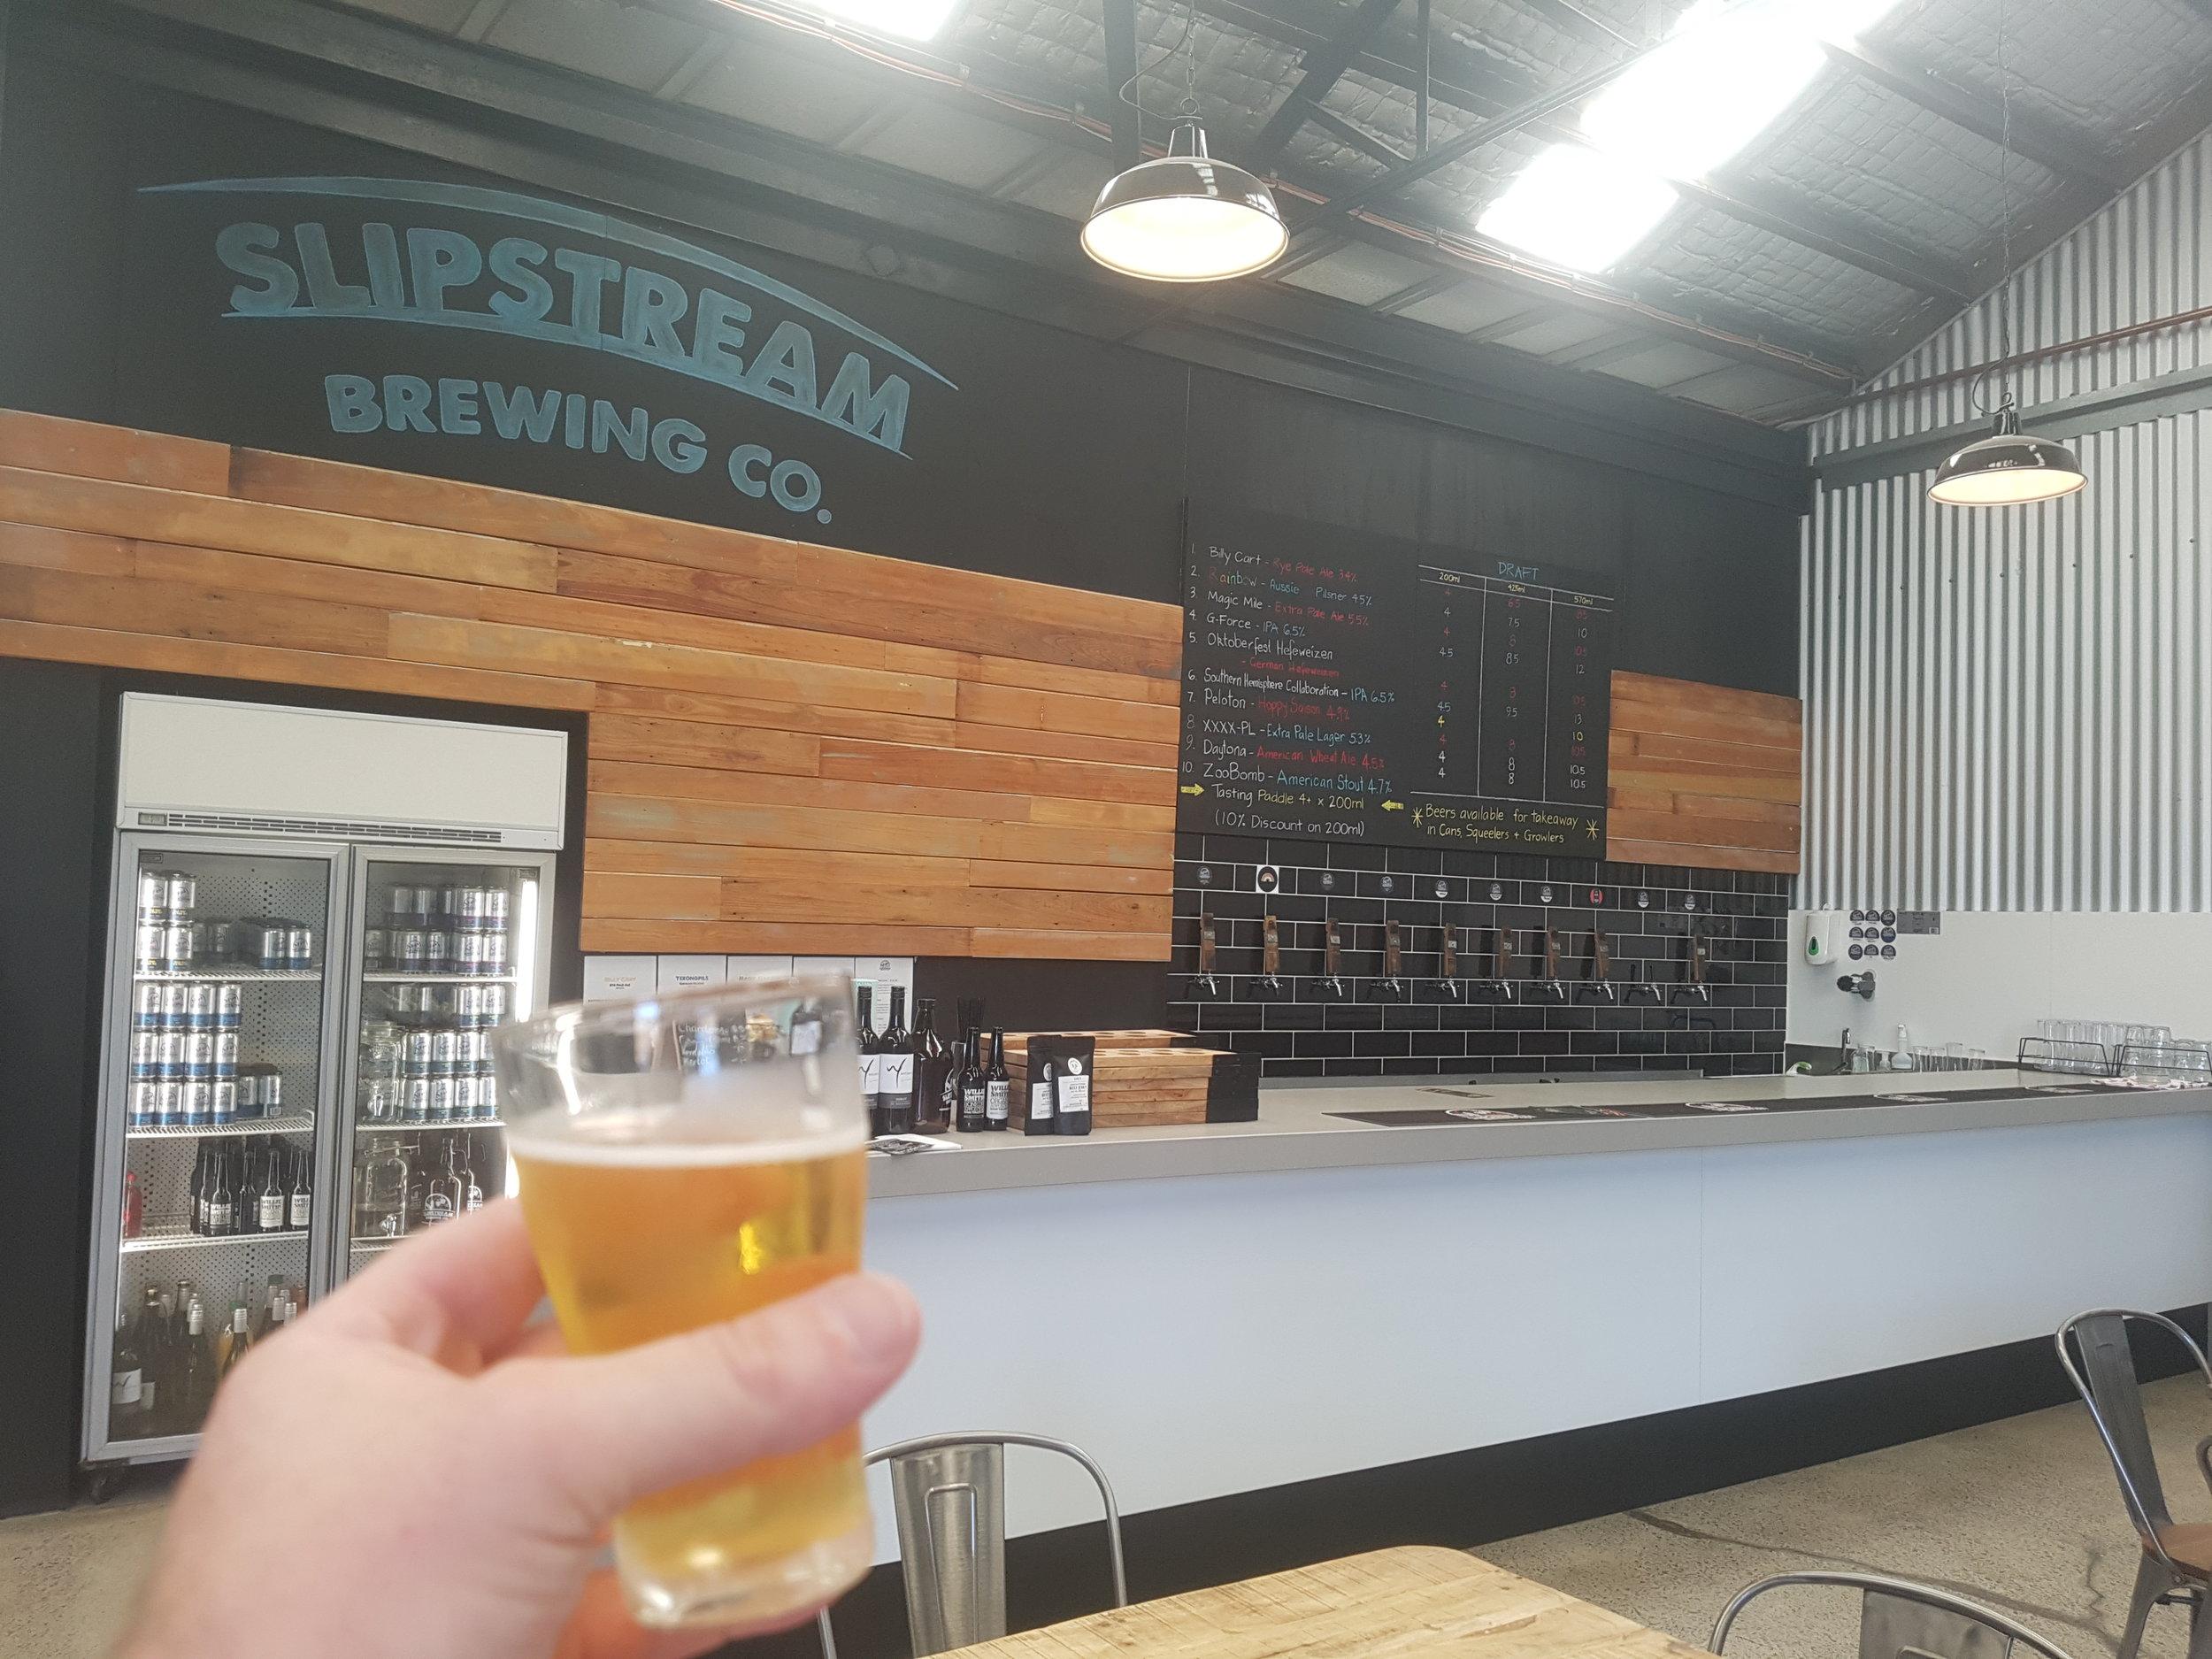 Slipstream-craft-brewery-tour